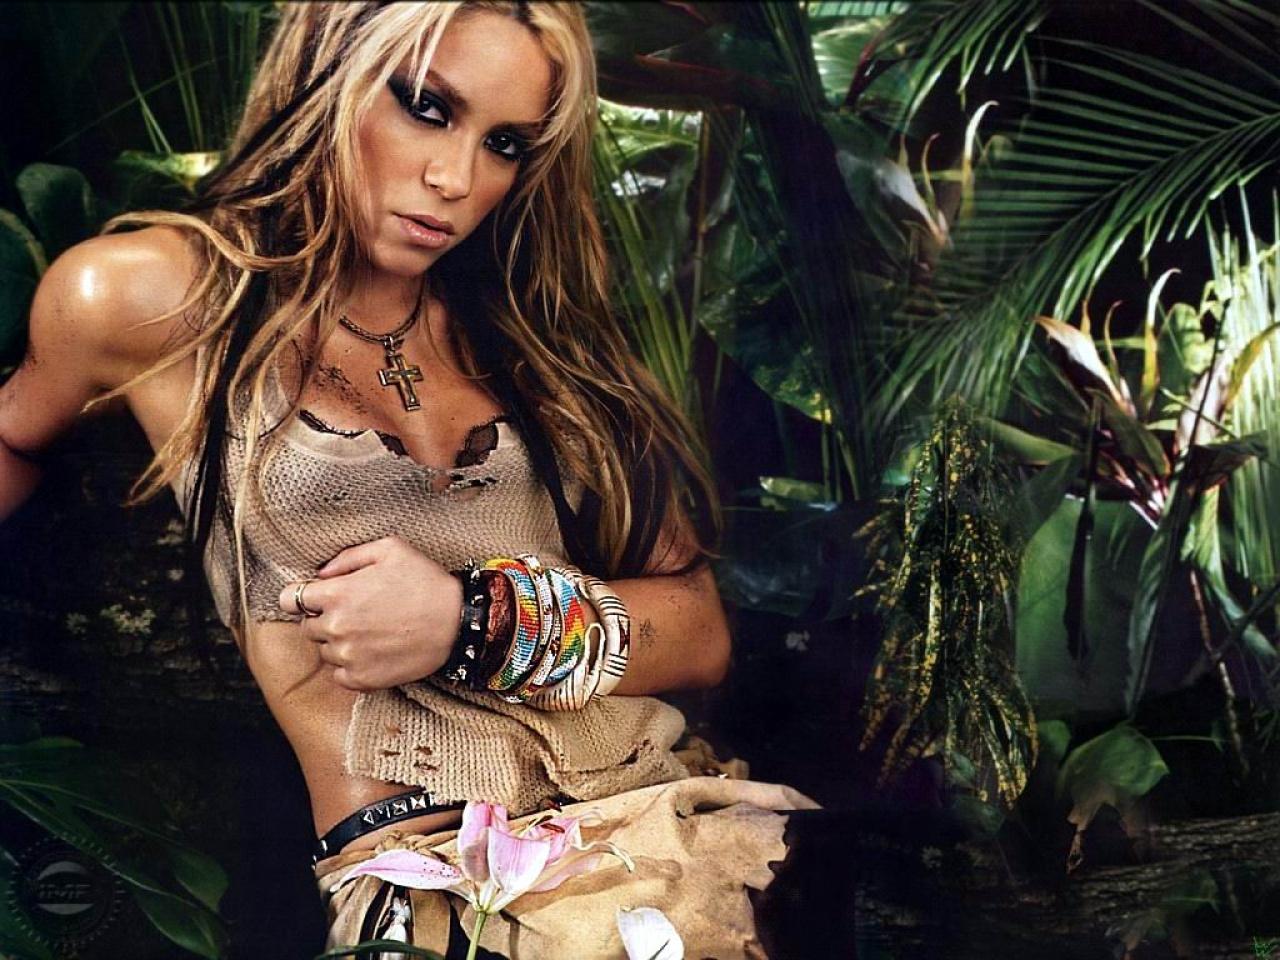 Musica Wallpapers gratis Shakira Fondos y wallpapers gratis para 1280x960